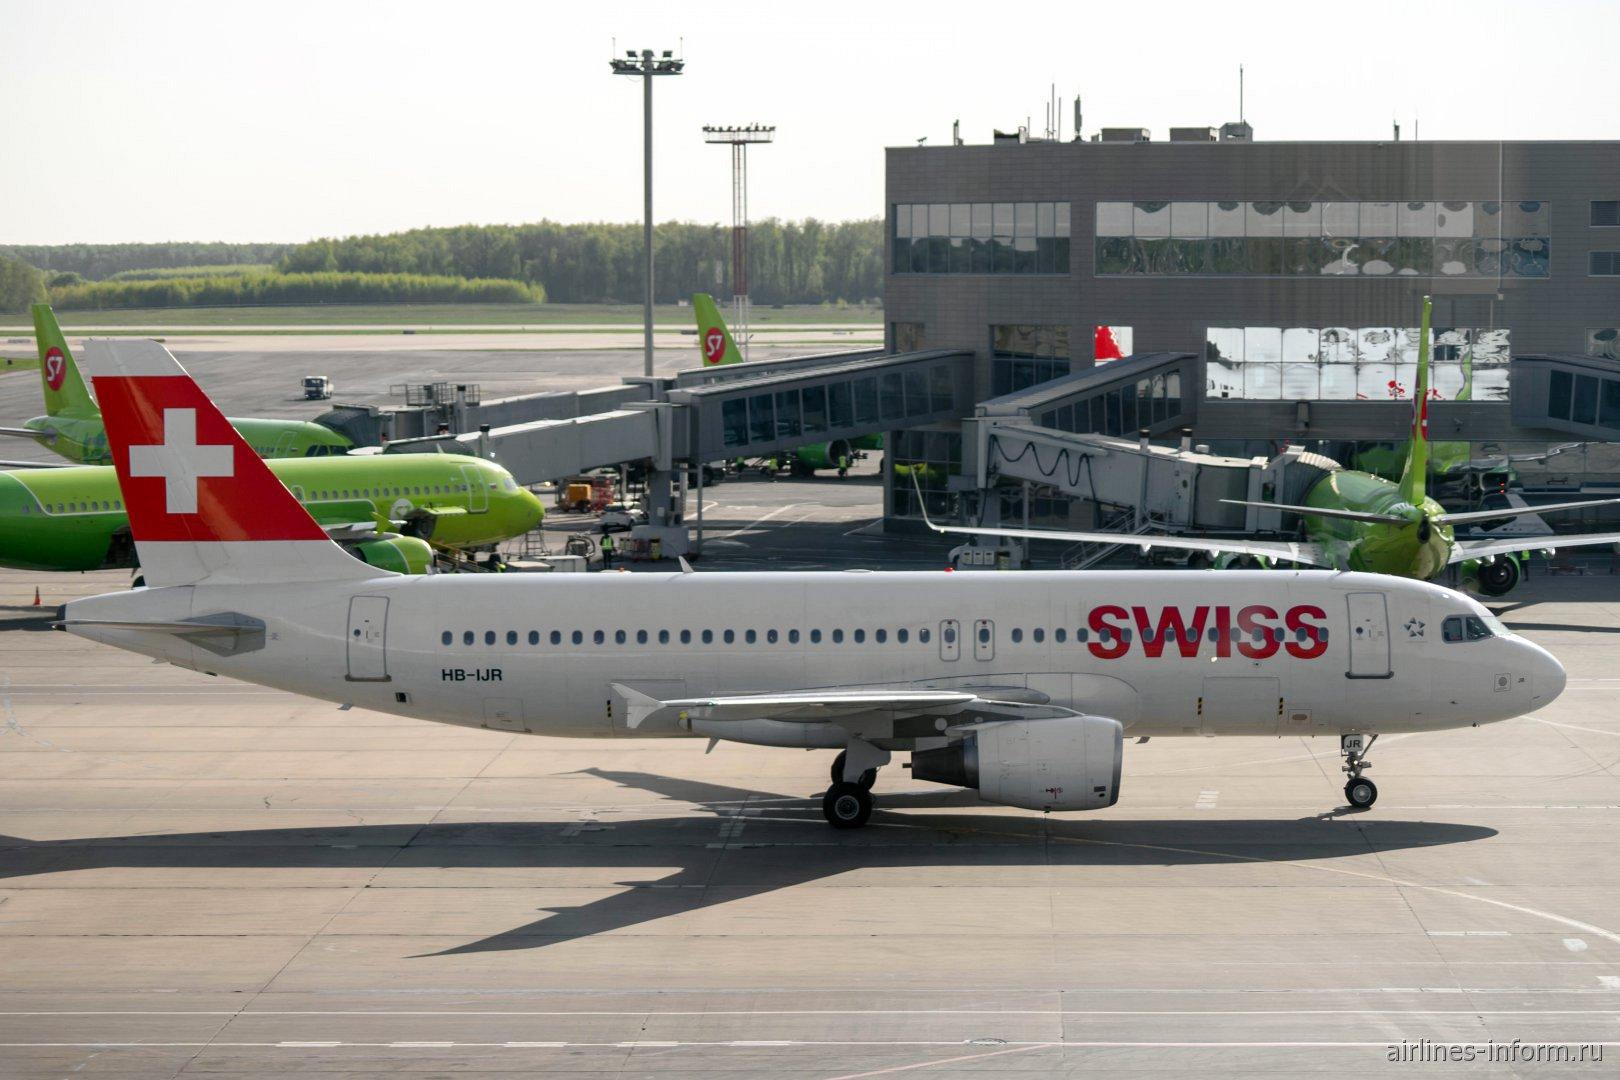 Airbus A320 HB-IJR авиакомпании SWISS в аэропорту Москва Домодедово